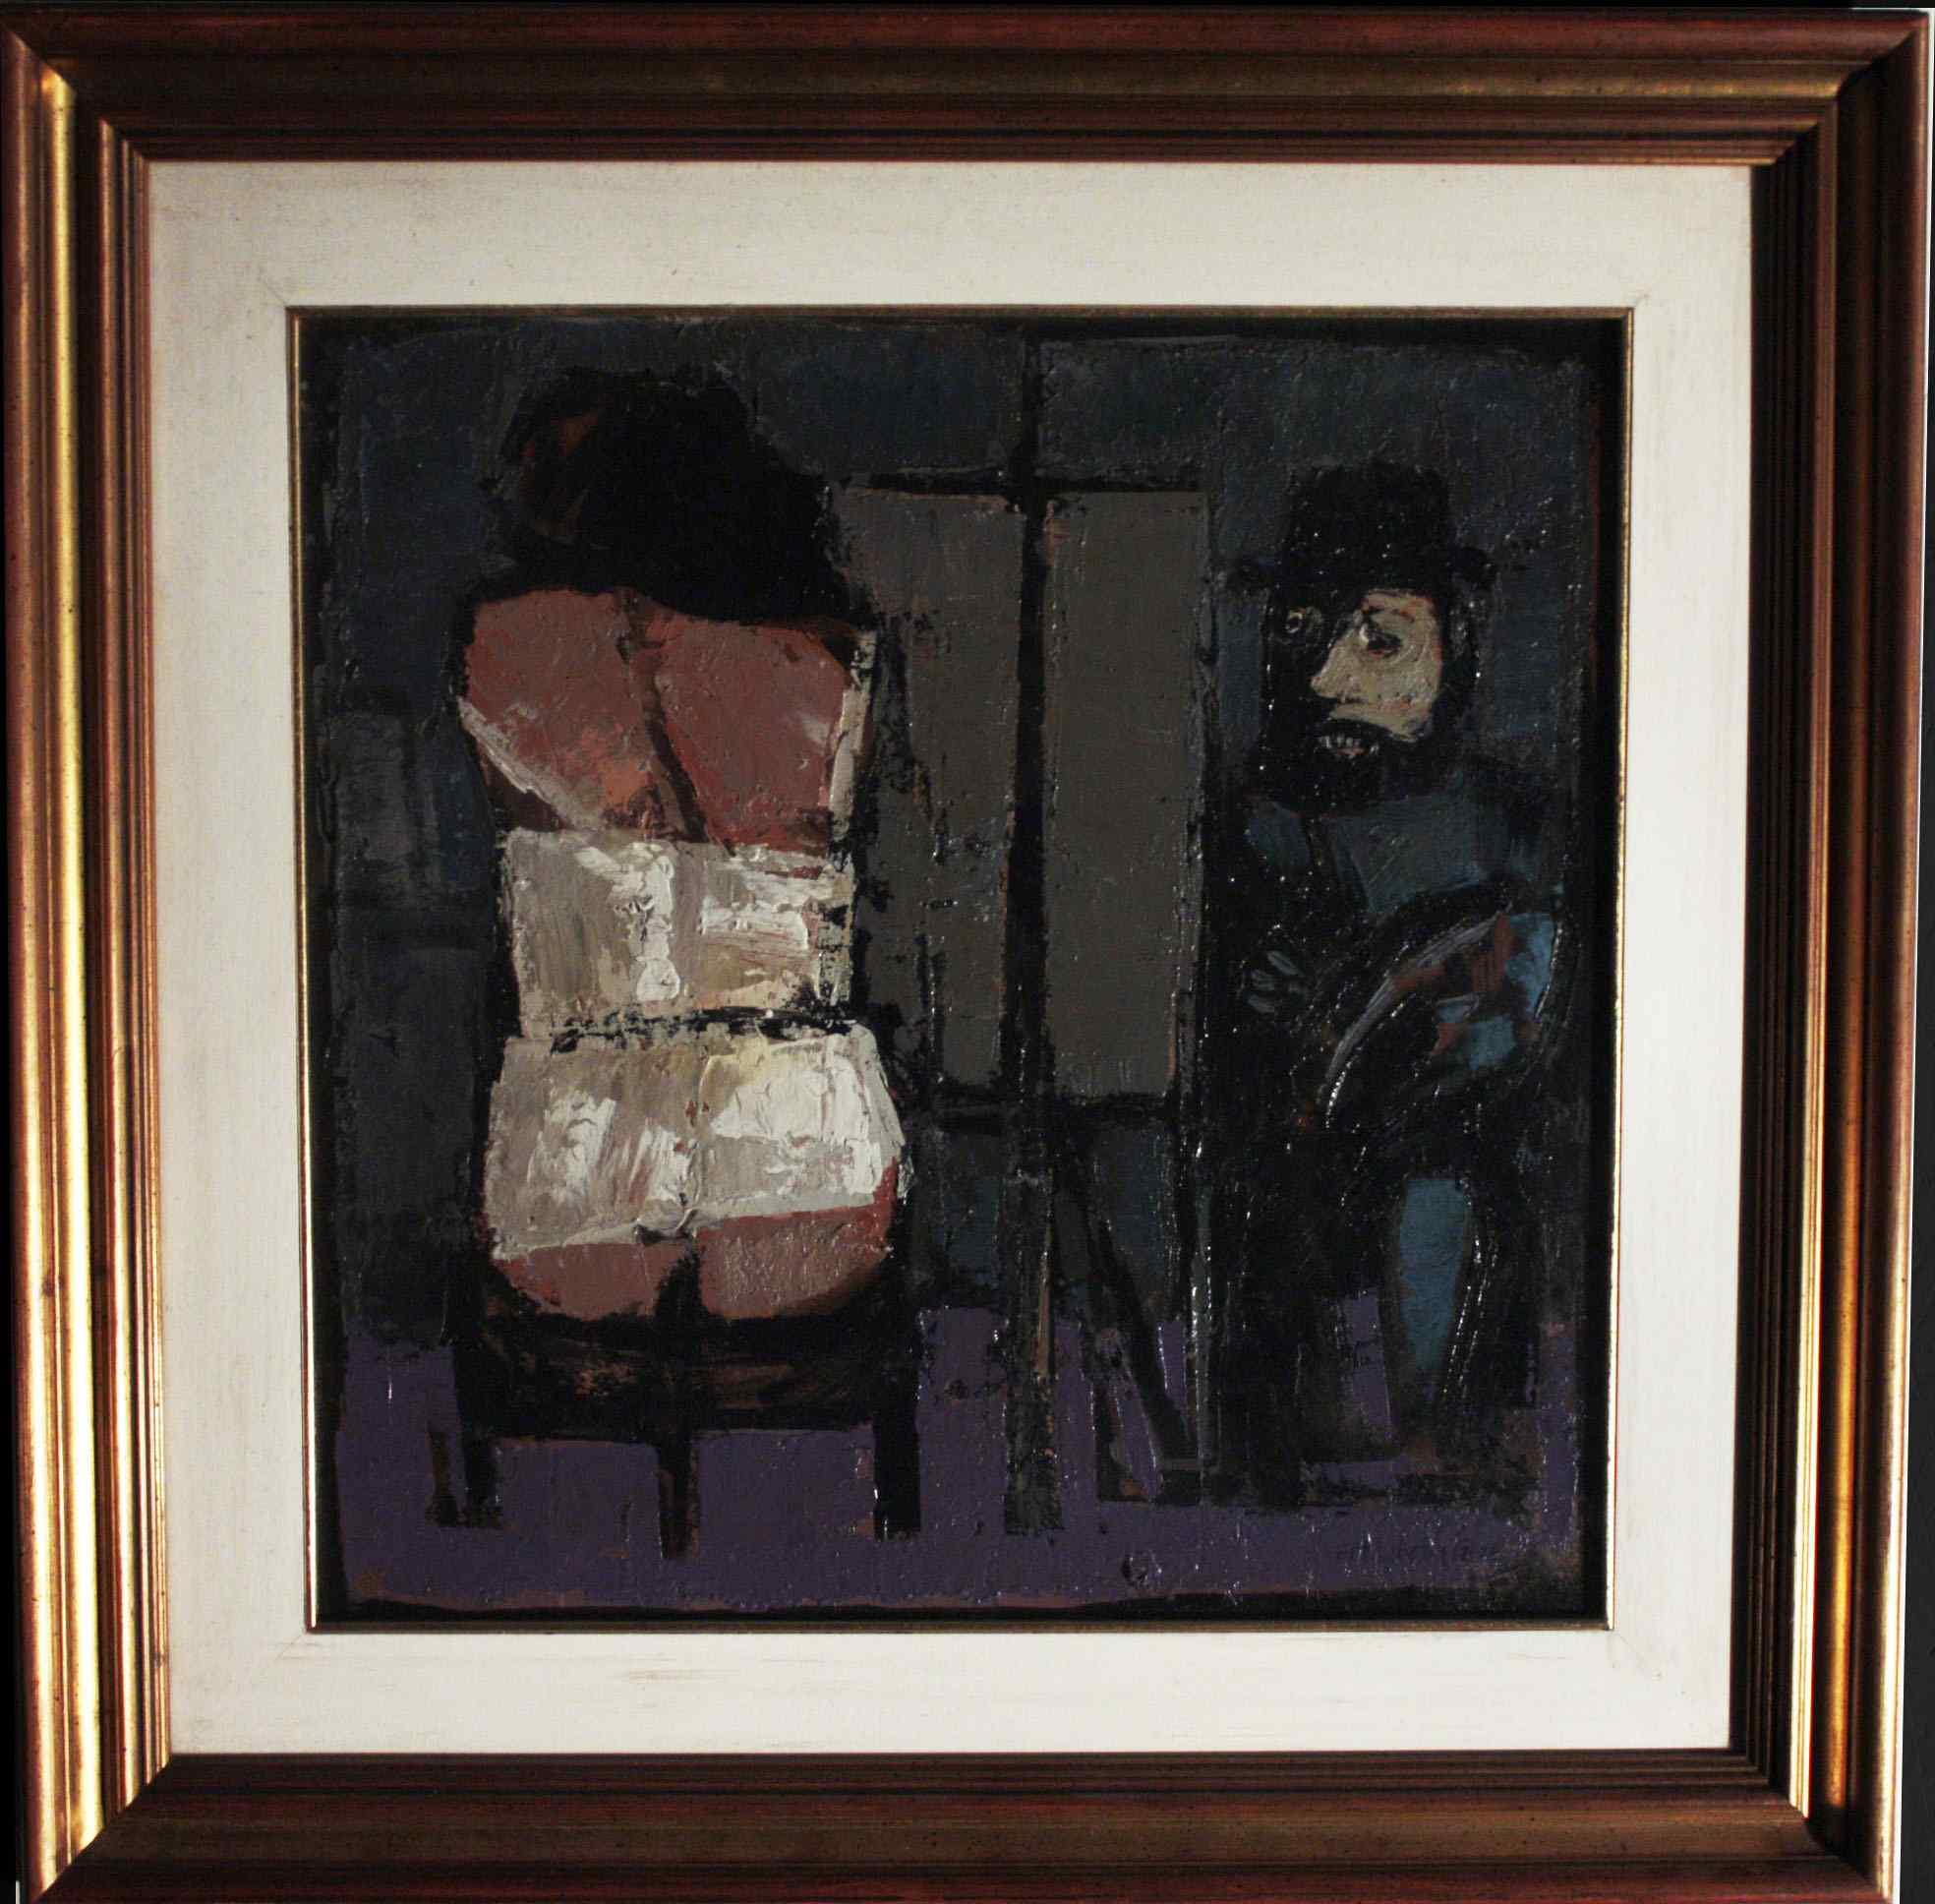 Fausto Maria Liberatore Lucca 1922 -2004 Peintre et modèle